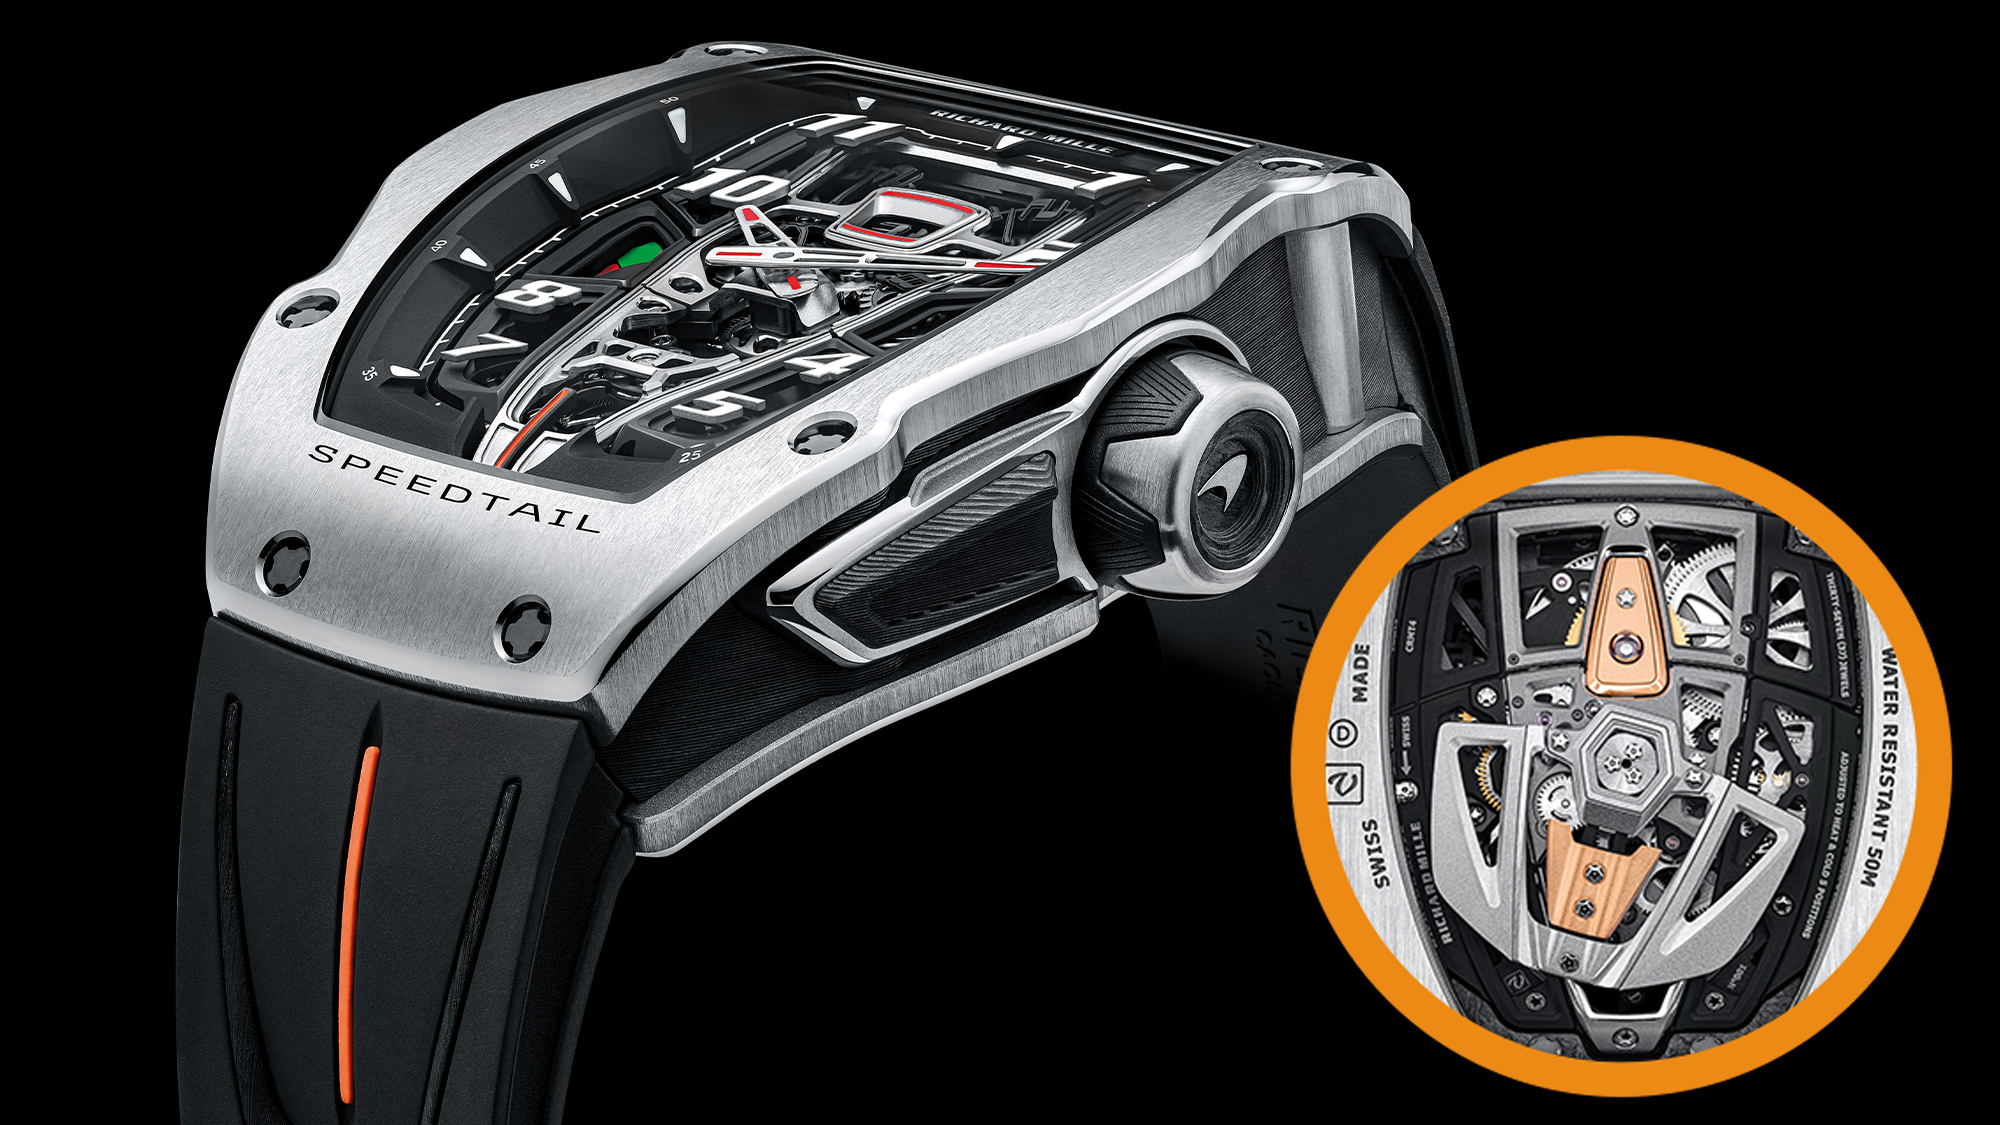 Richard Mille McLaren Speedtail